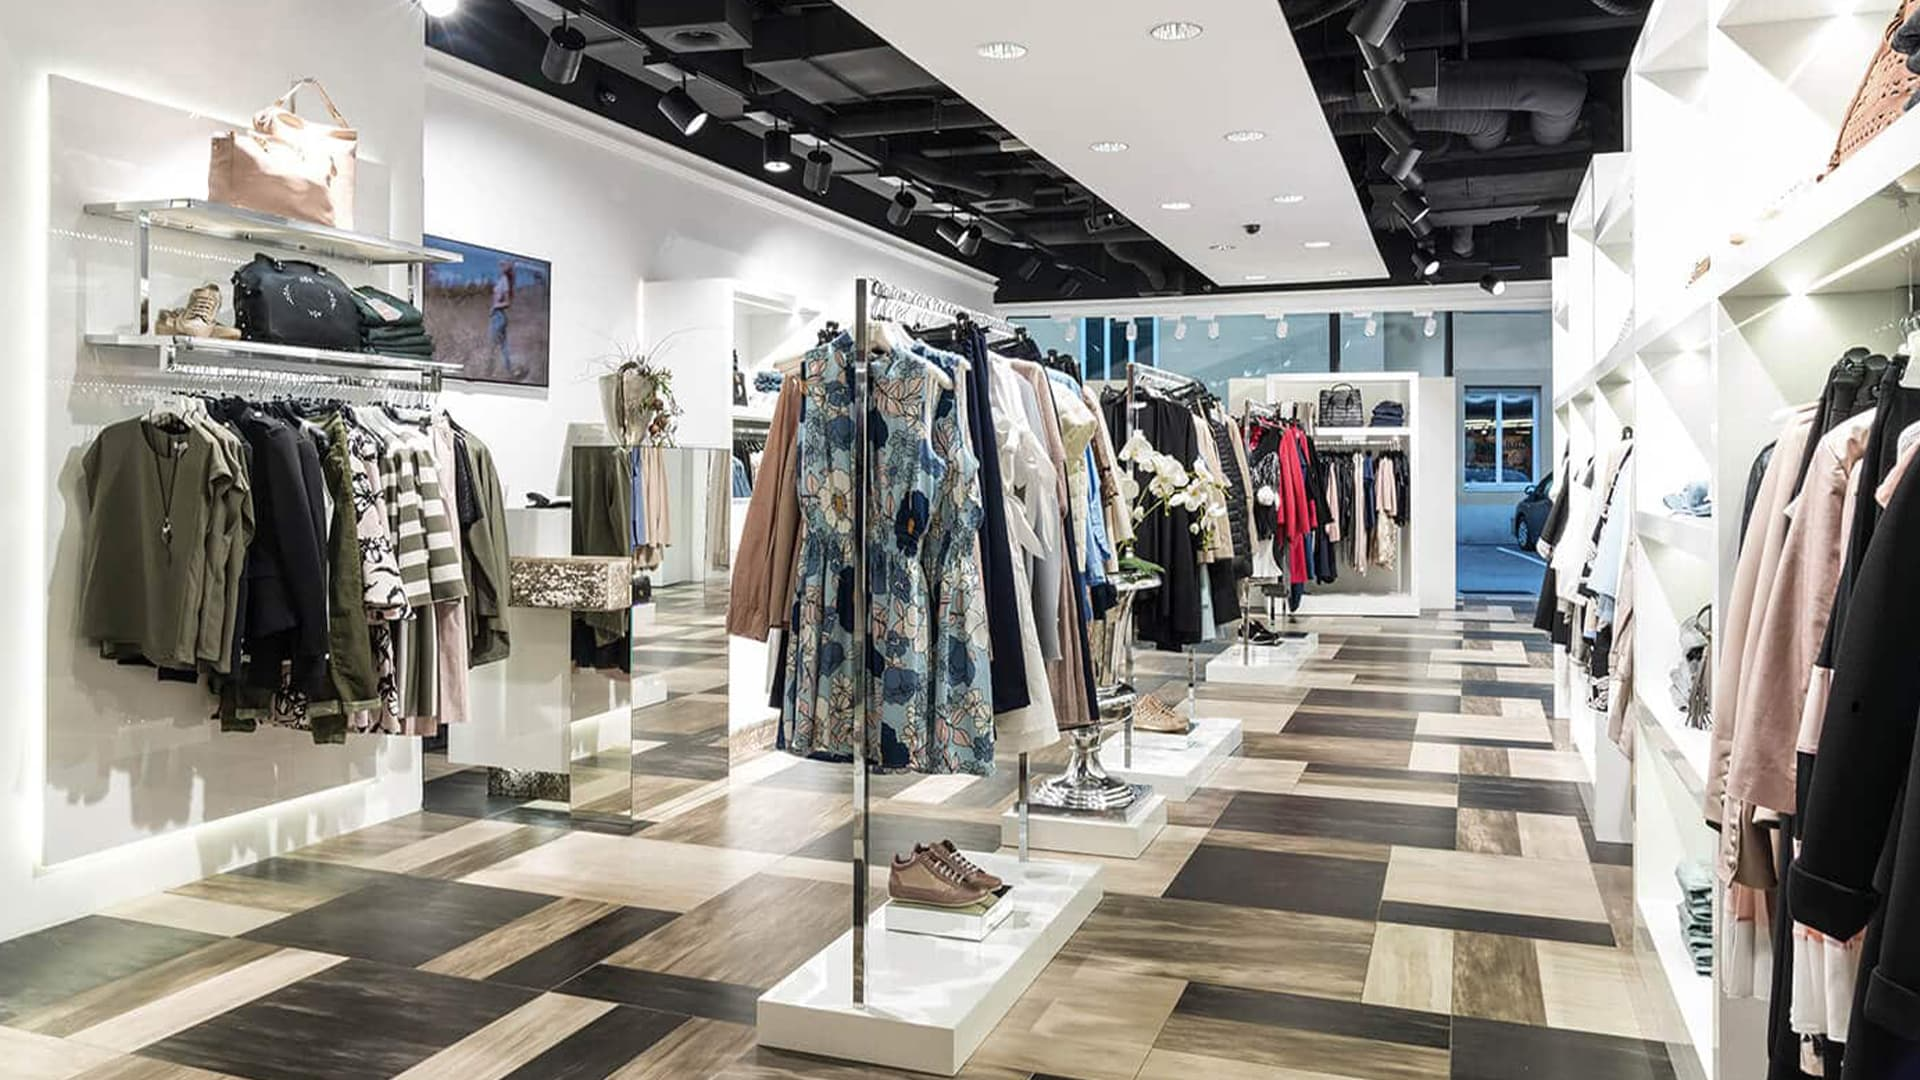 Ladenbau Vorarlberg Blickfang Fashion